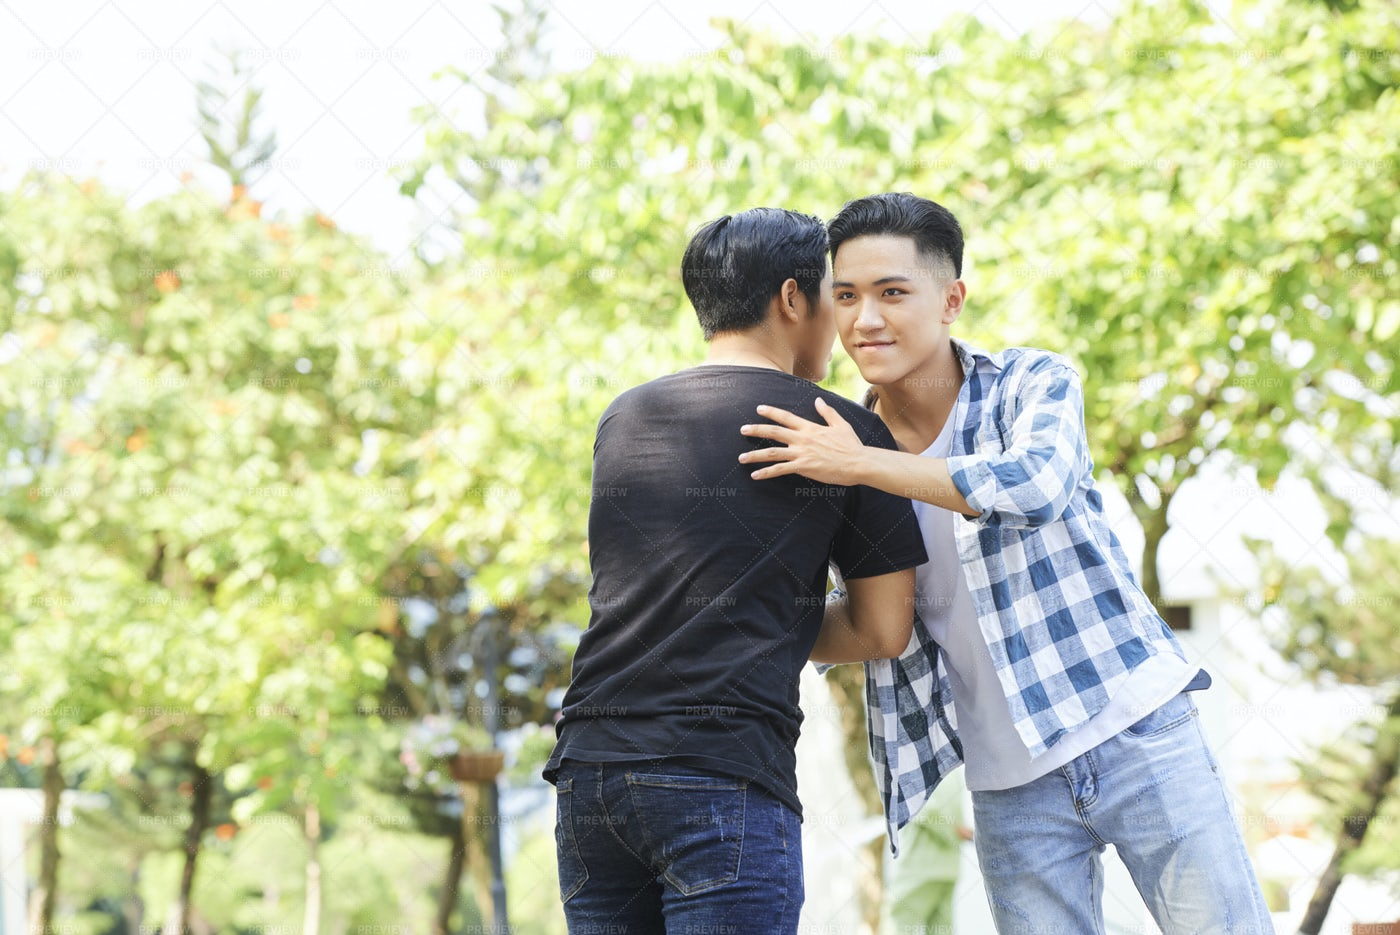 Friendly Handshake Outdoors: Stock Photos